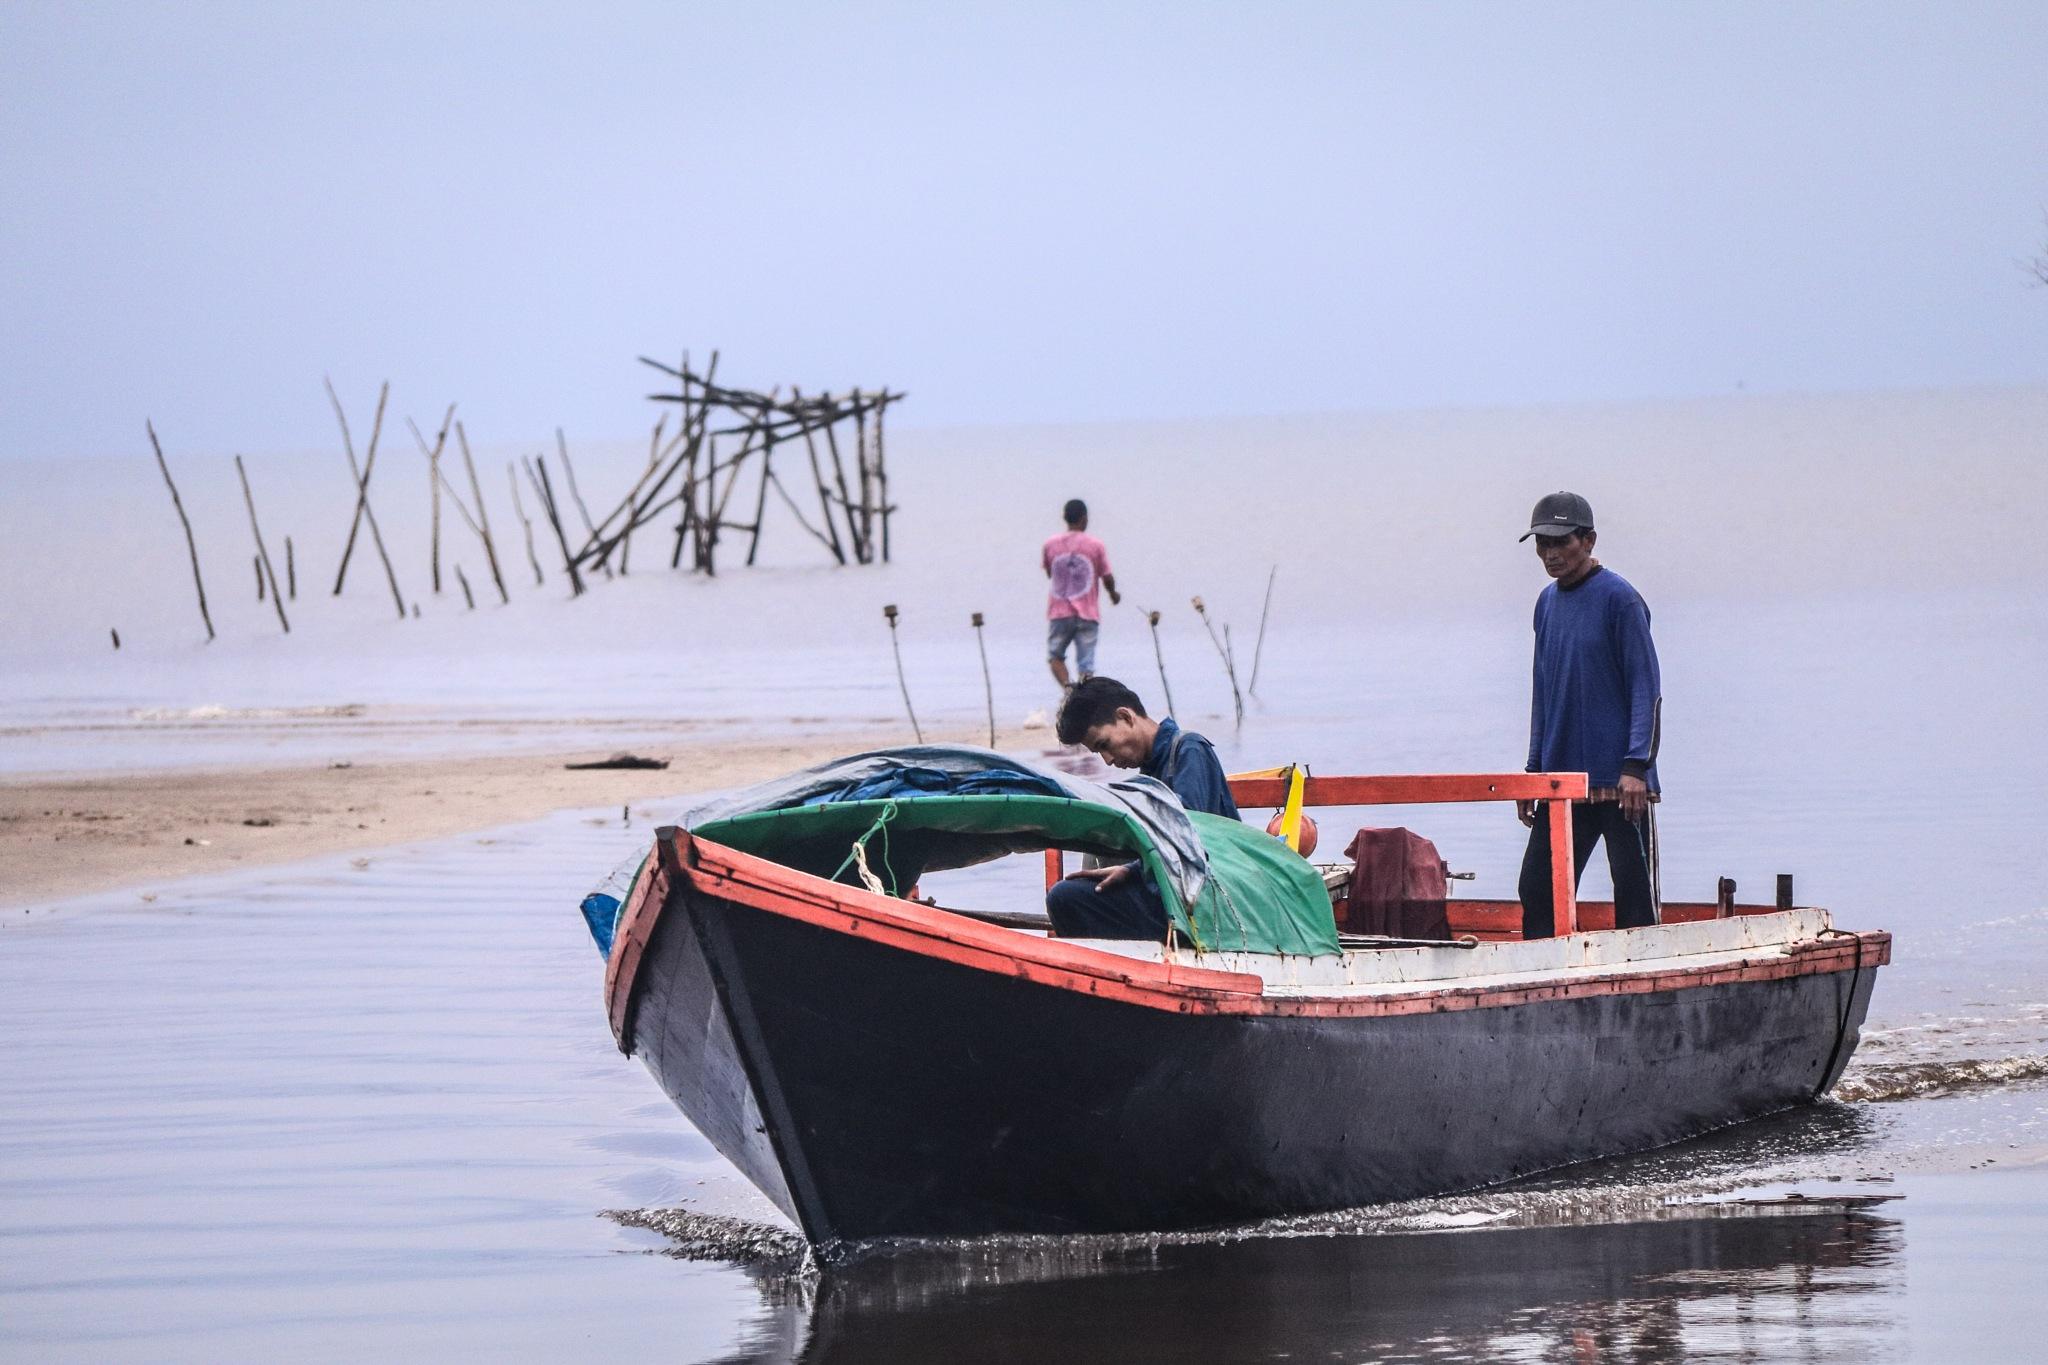 fisherman samboja by Yadi Liauw